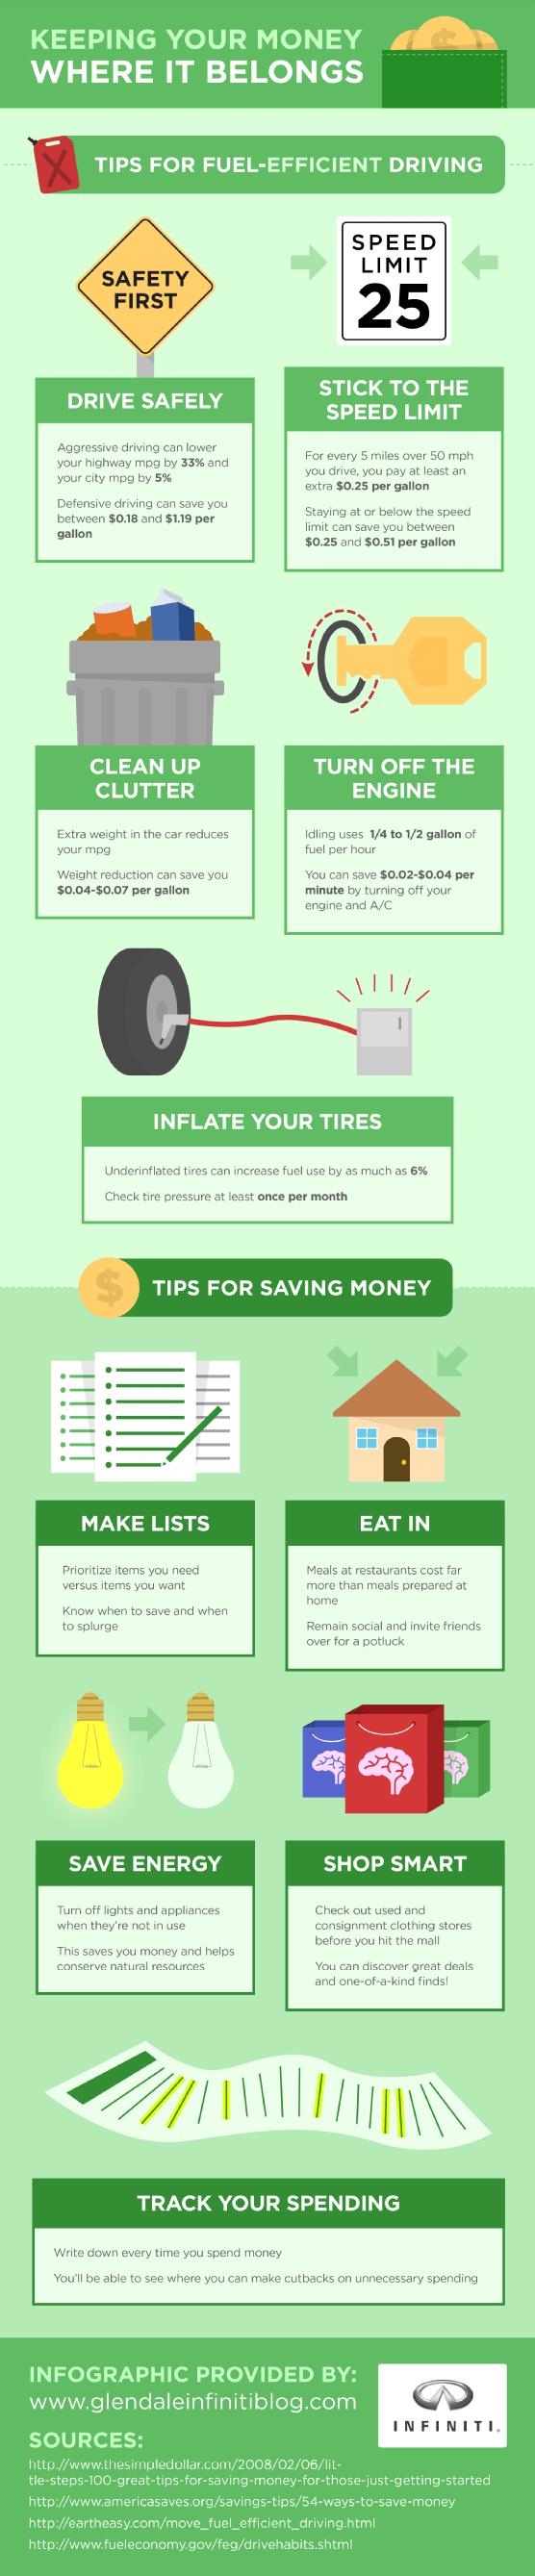 tips-for-saving-mpg--keeping-your-money-where-it-belongs_51ec40c70c9b2